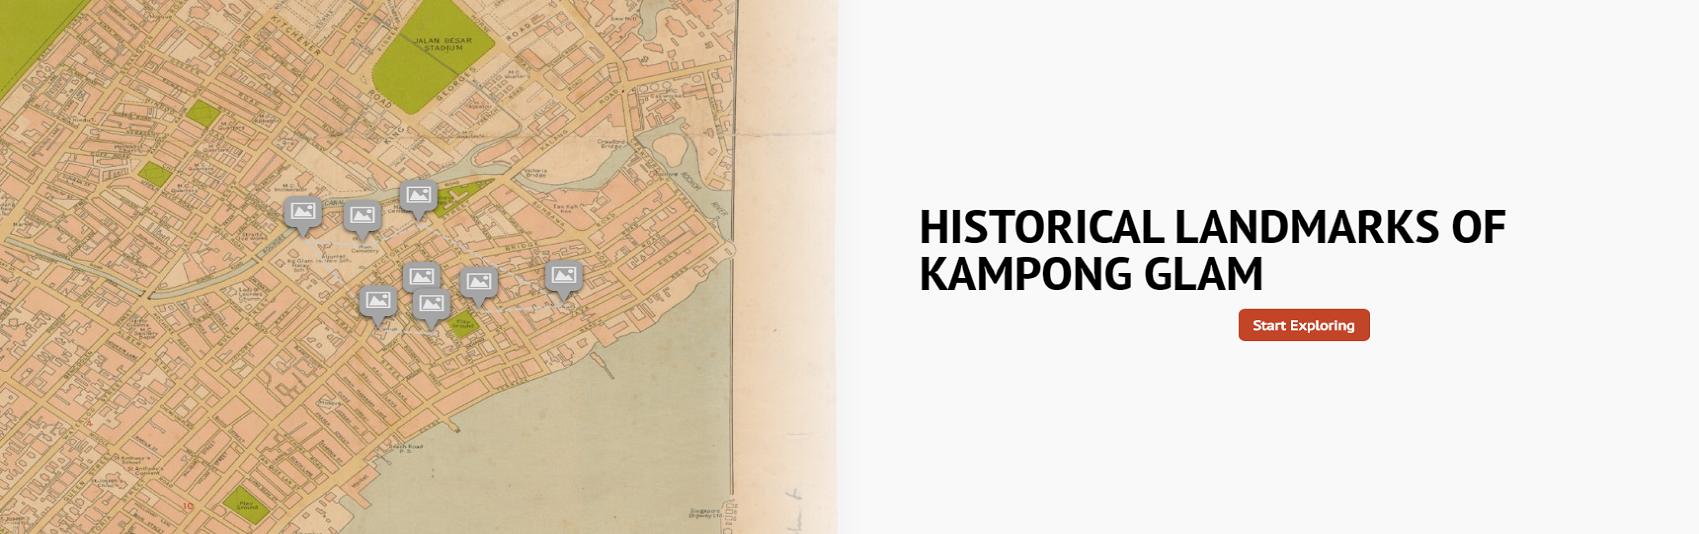 storymap-kampong-glam-landmarks